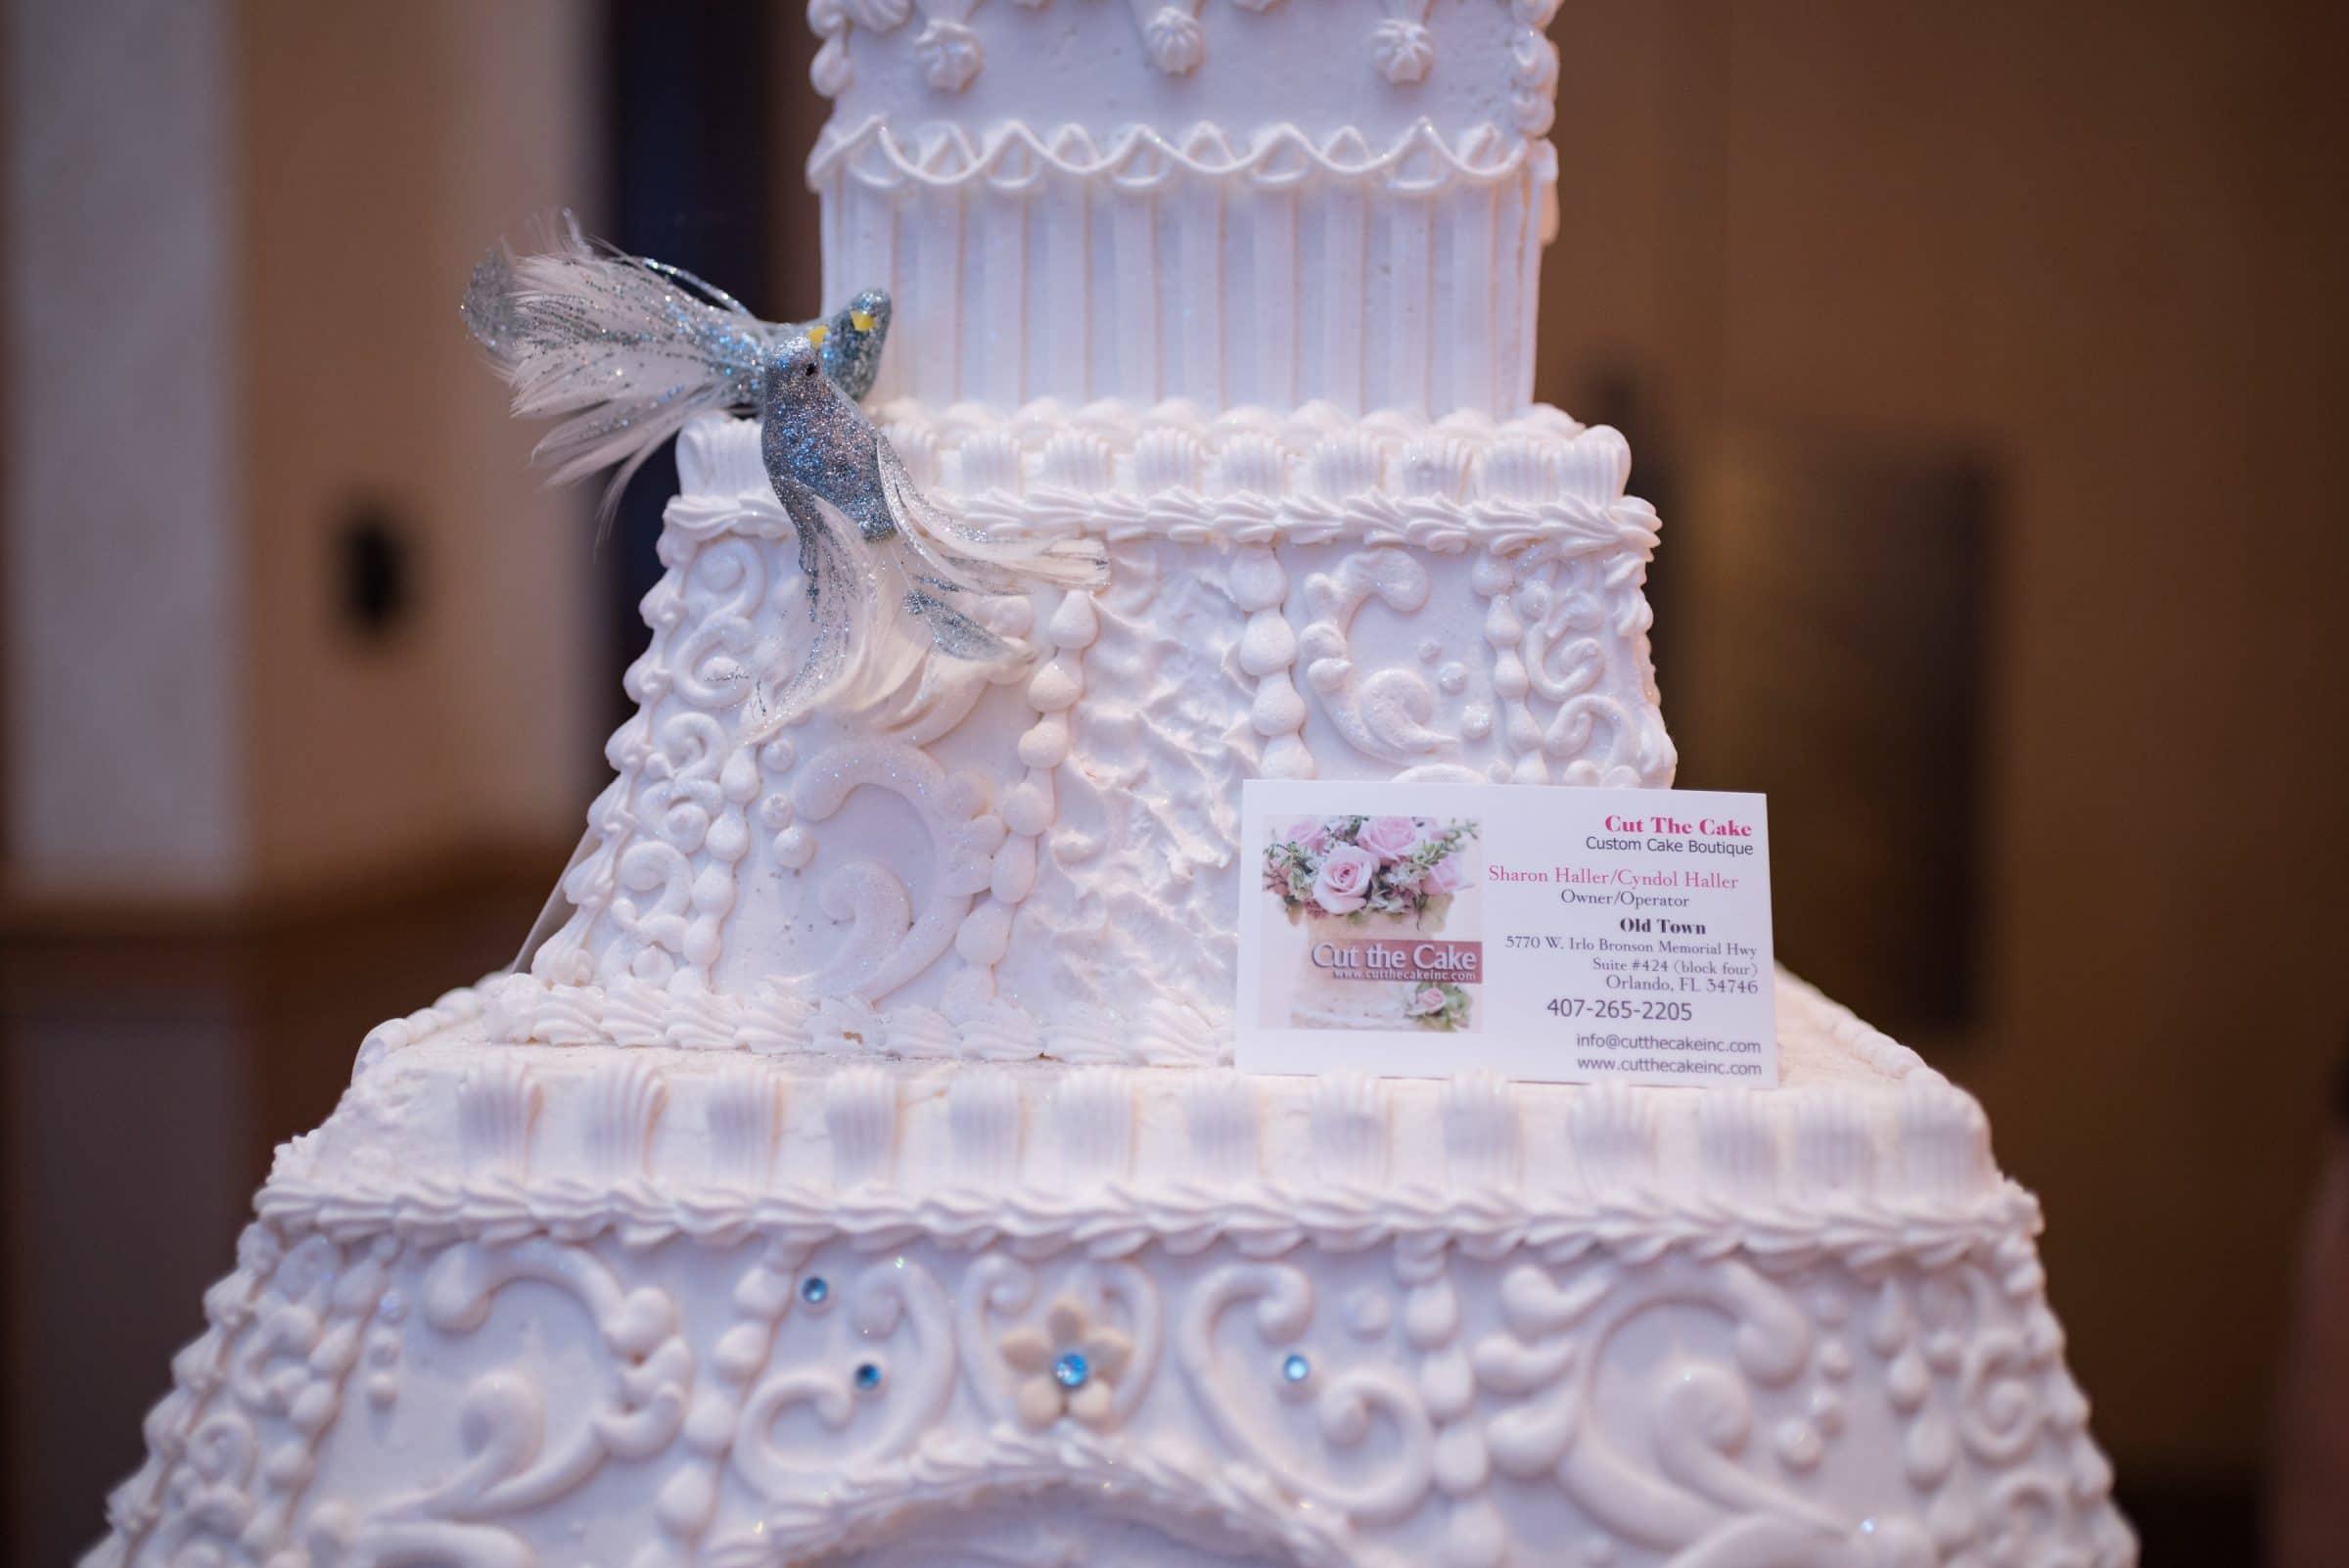 Eiffel Tower Shaped Wedding Cake